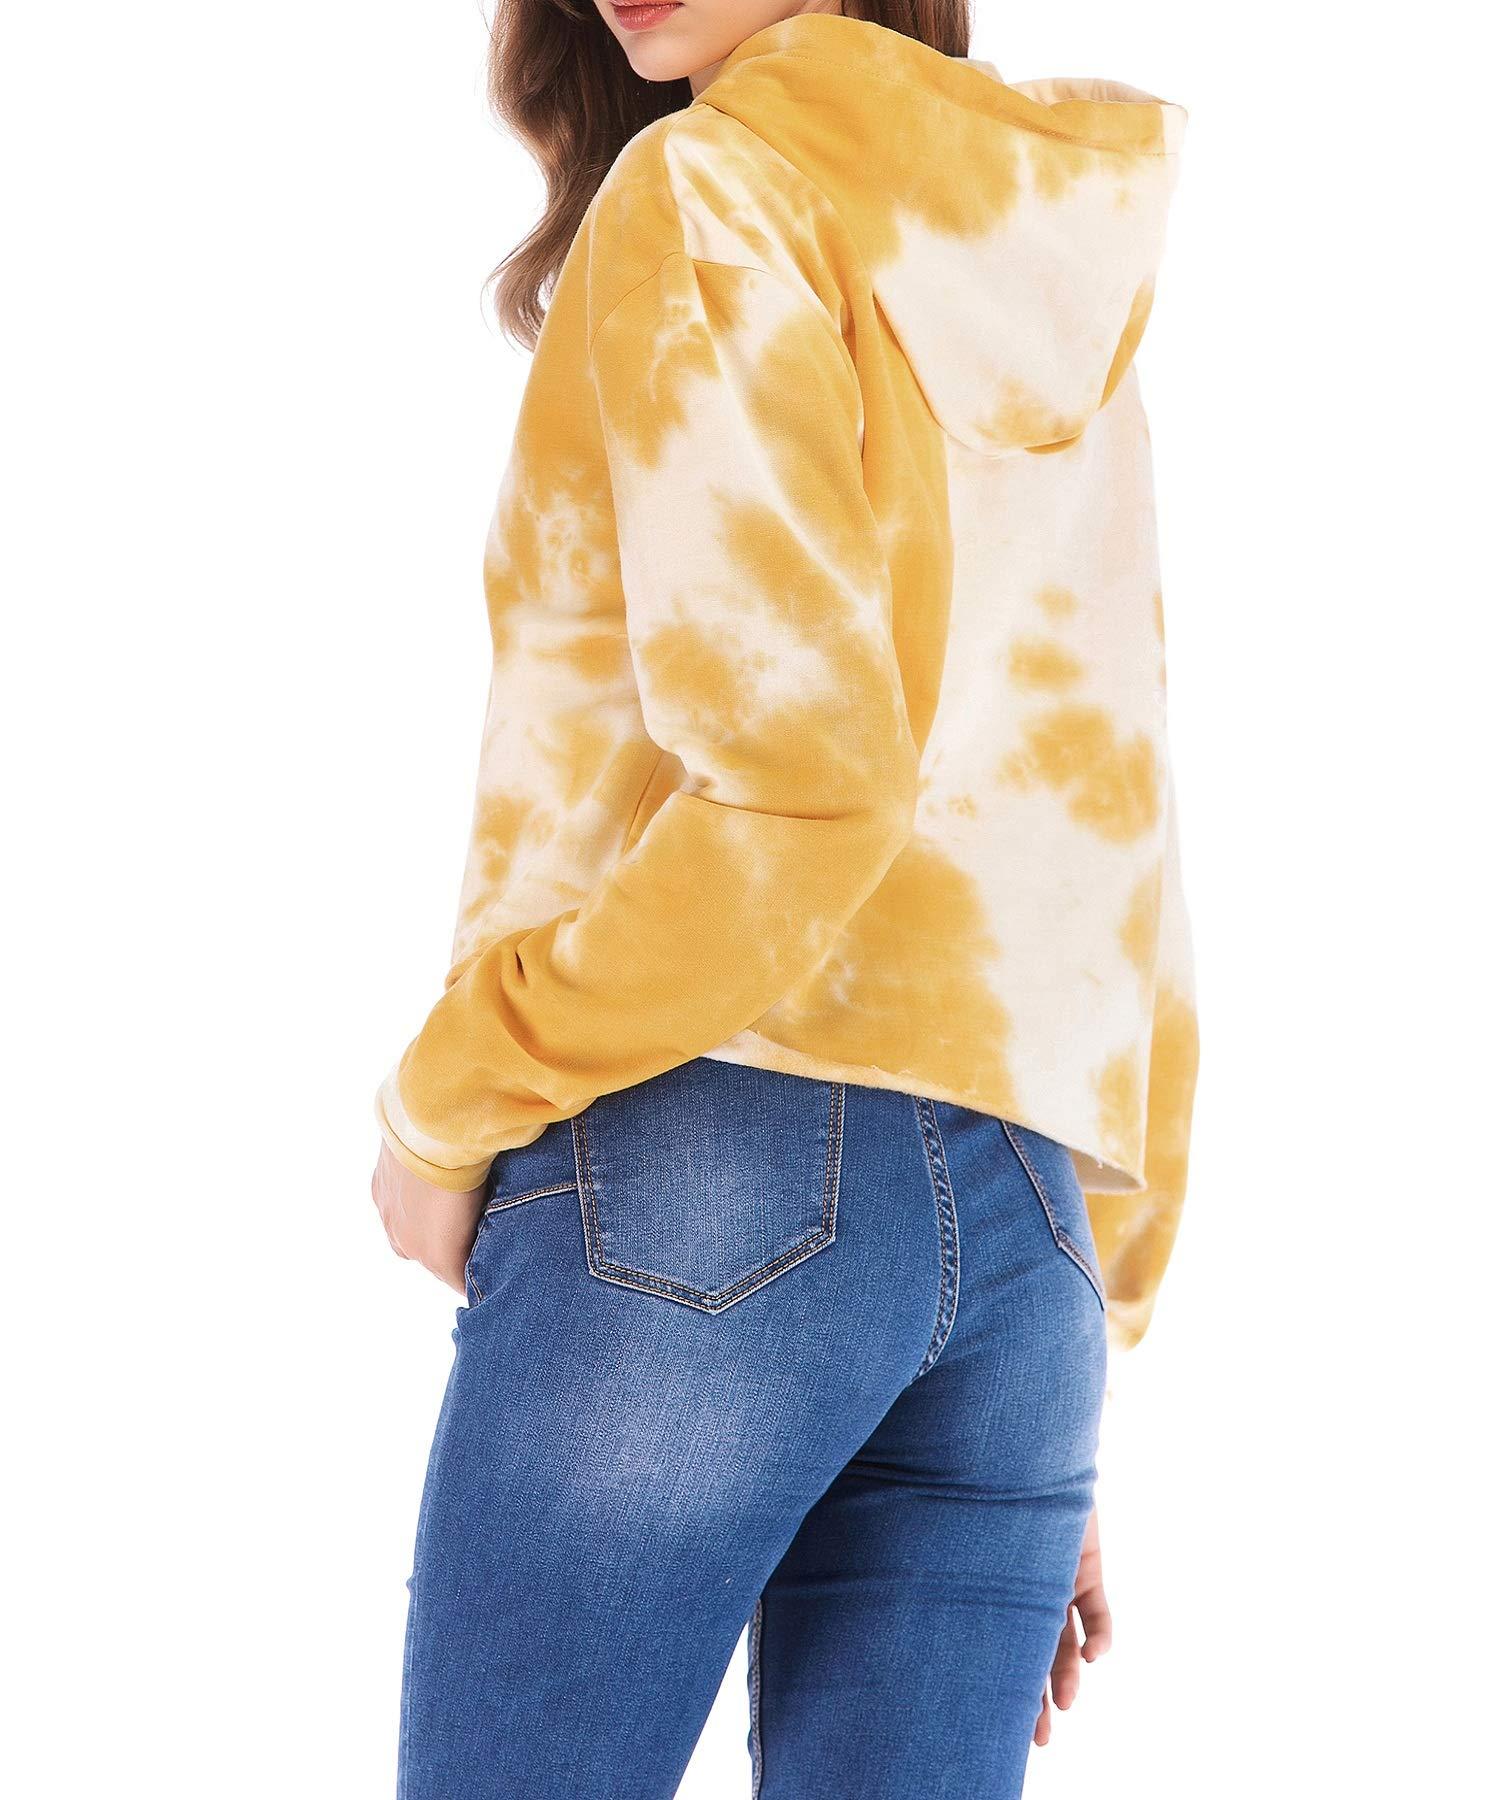 Eanklosco Womens Casual Long Sleeve Tie Dye Hoody (Yellow, XL)